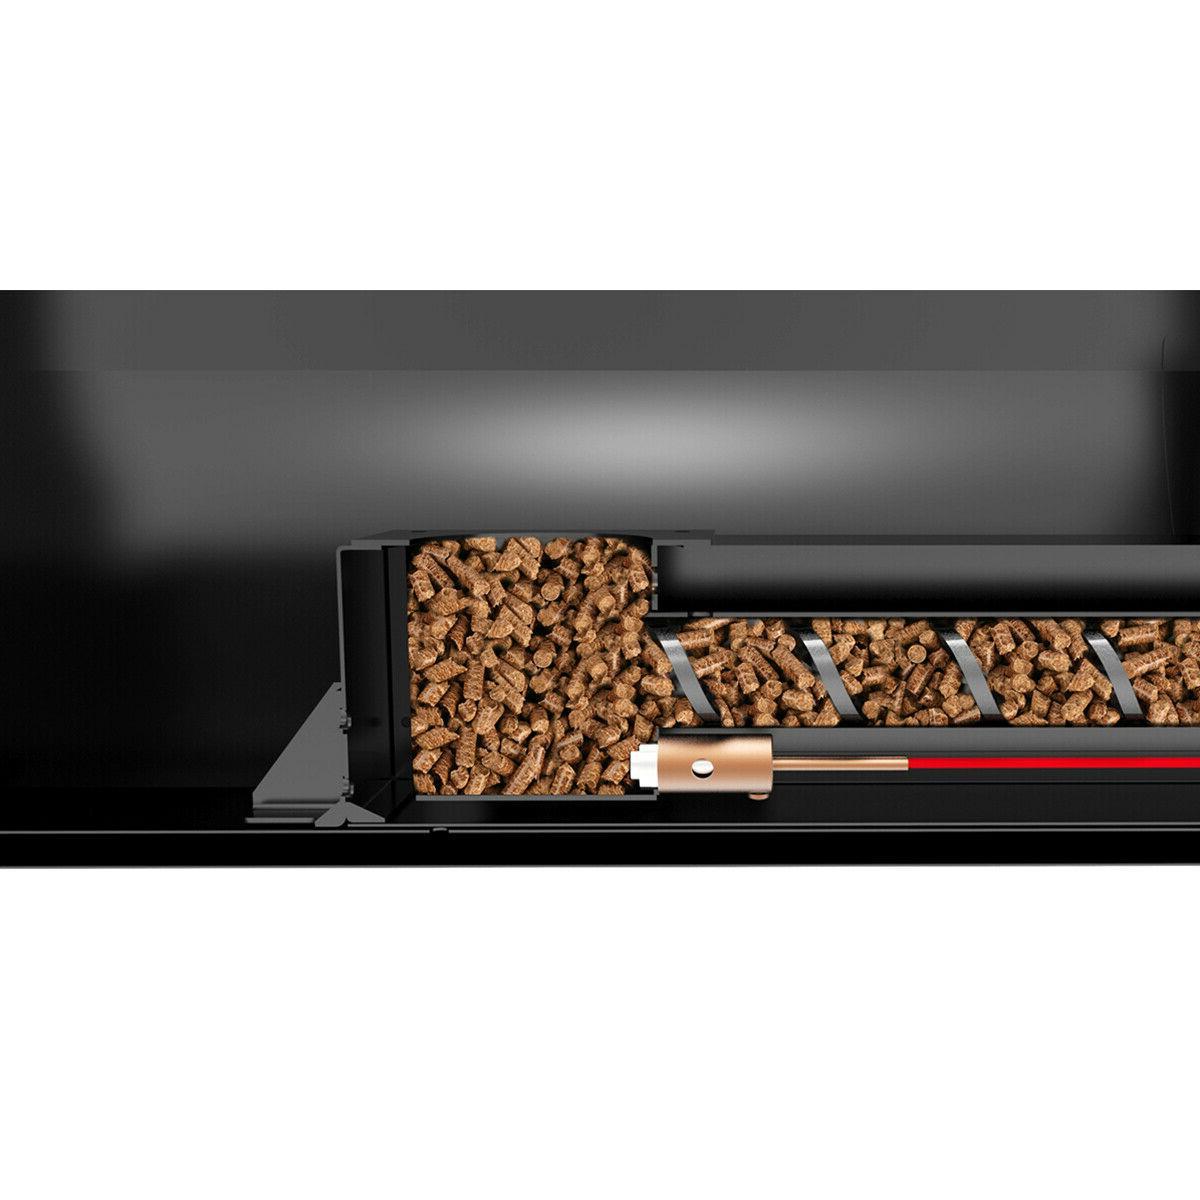 Z GRILLS Wood Pellet with Digital